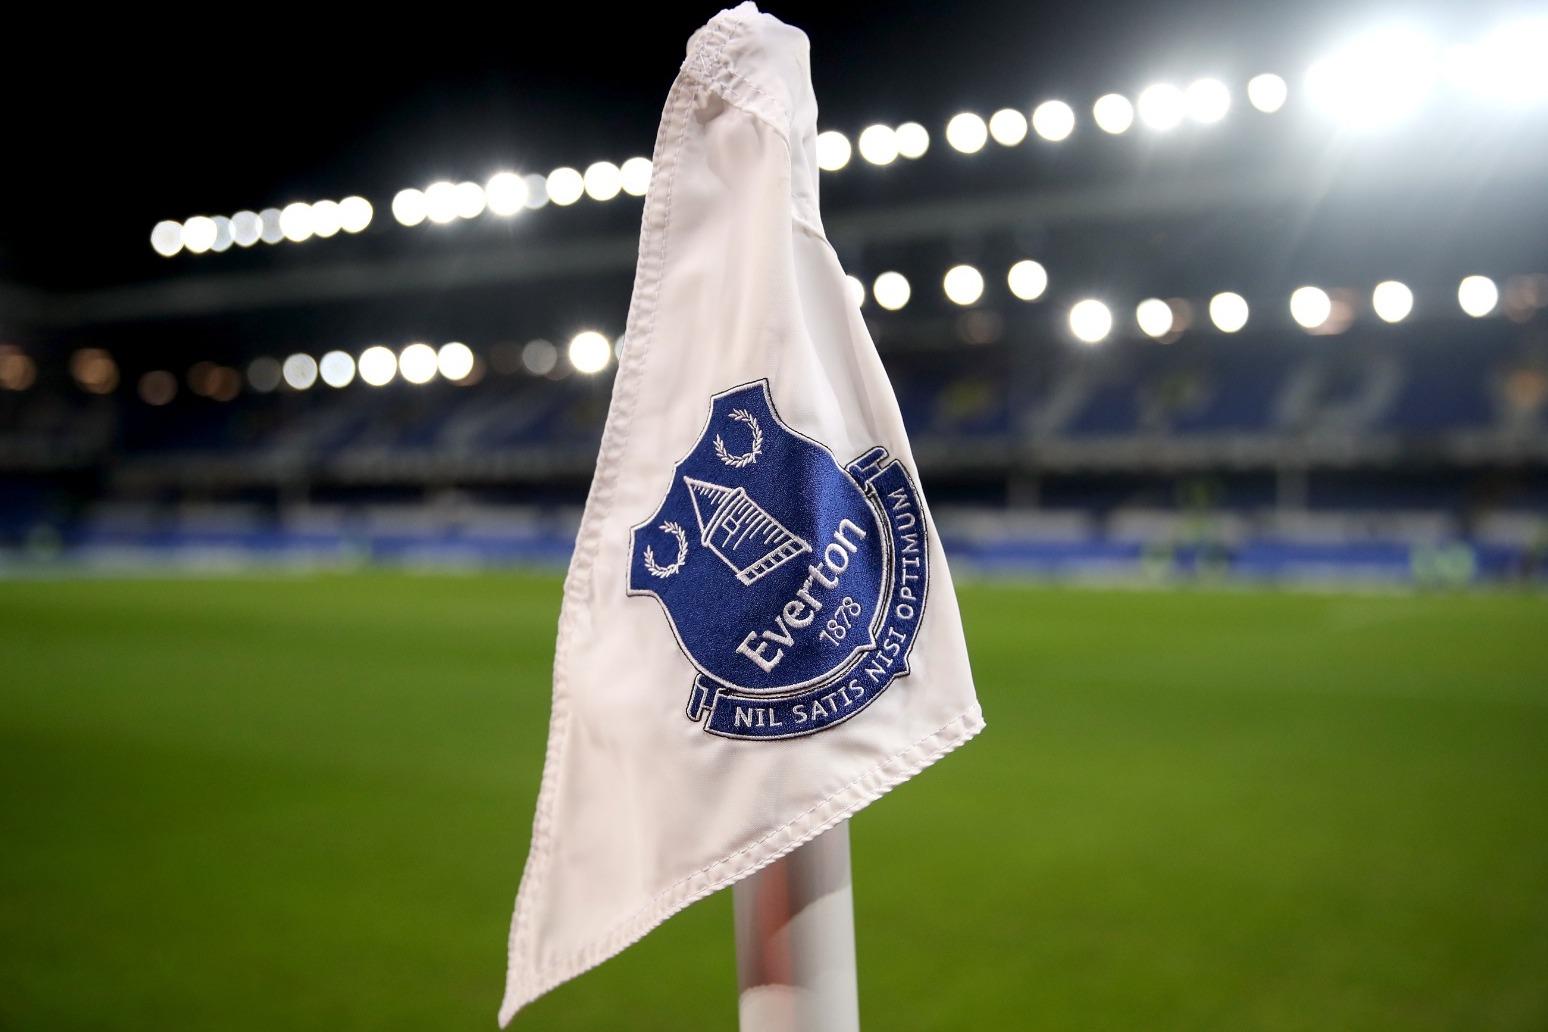 New Everton boss Rafael Benitez has felt support from fans living close by